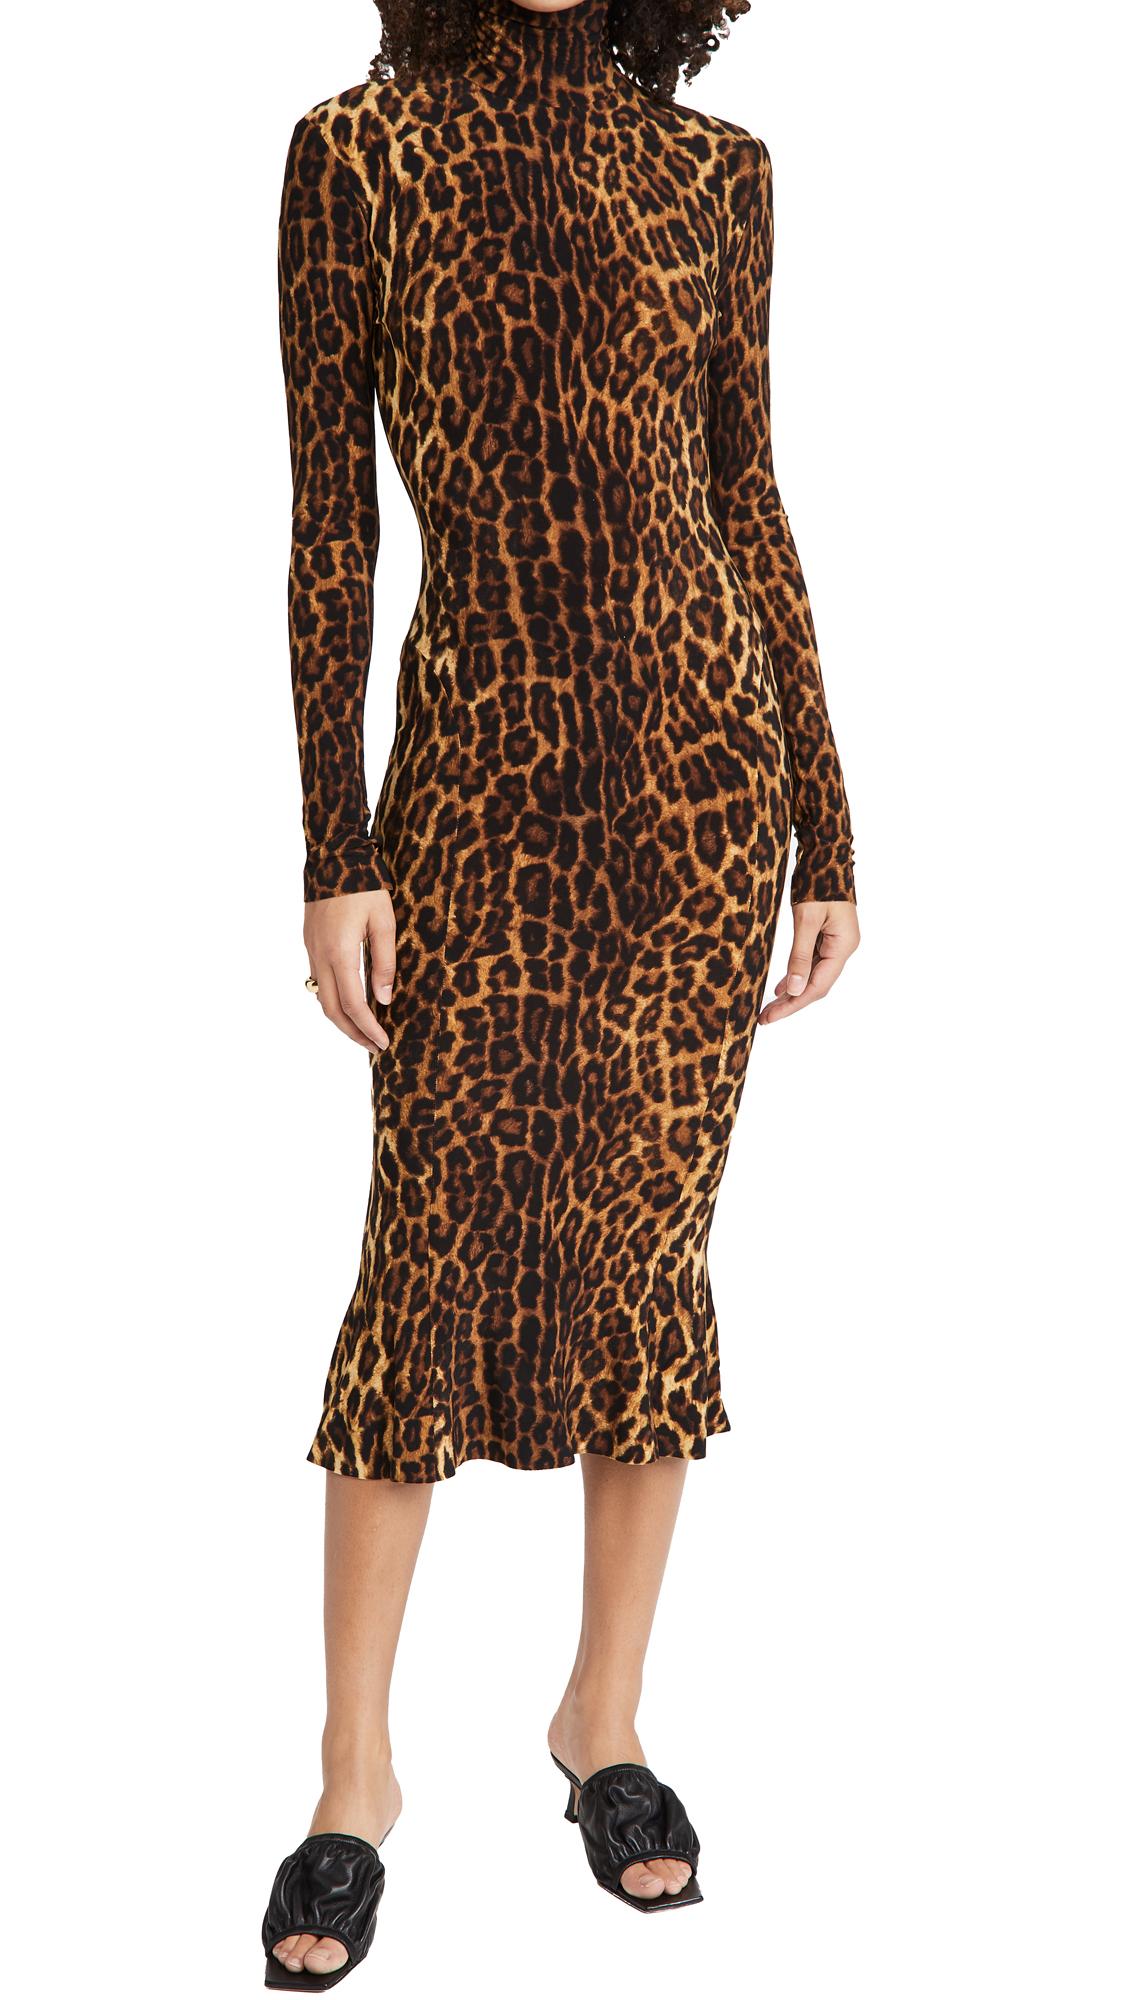 Norma Kamali Long Sleeve Turtleneck Fishtail Dress